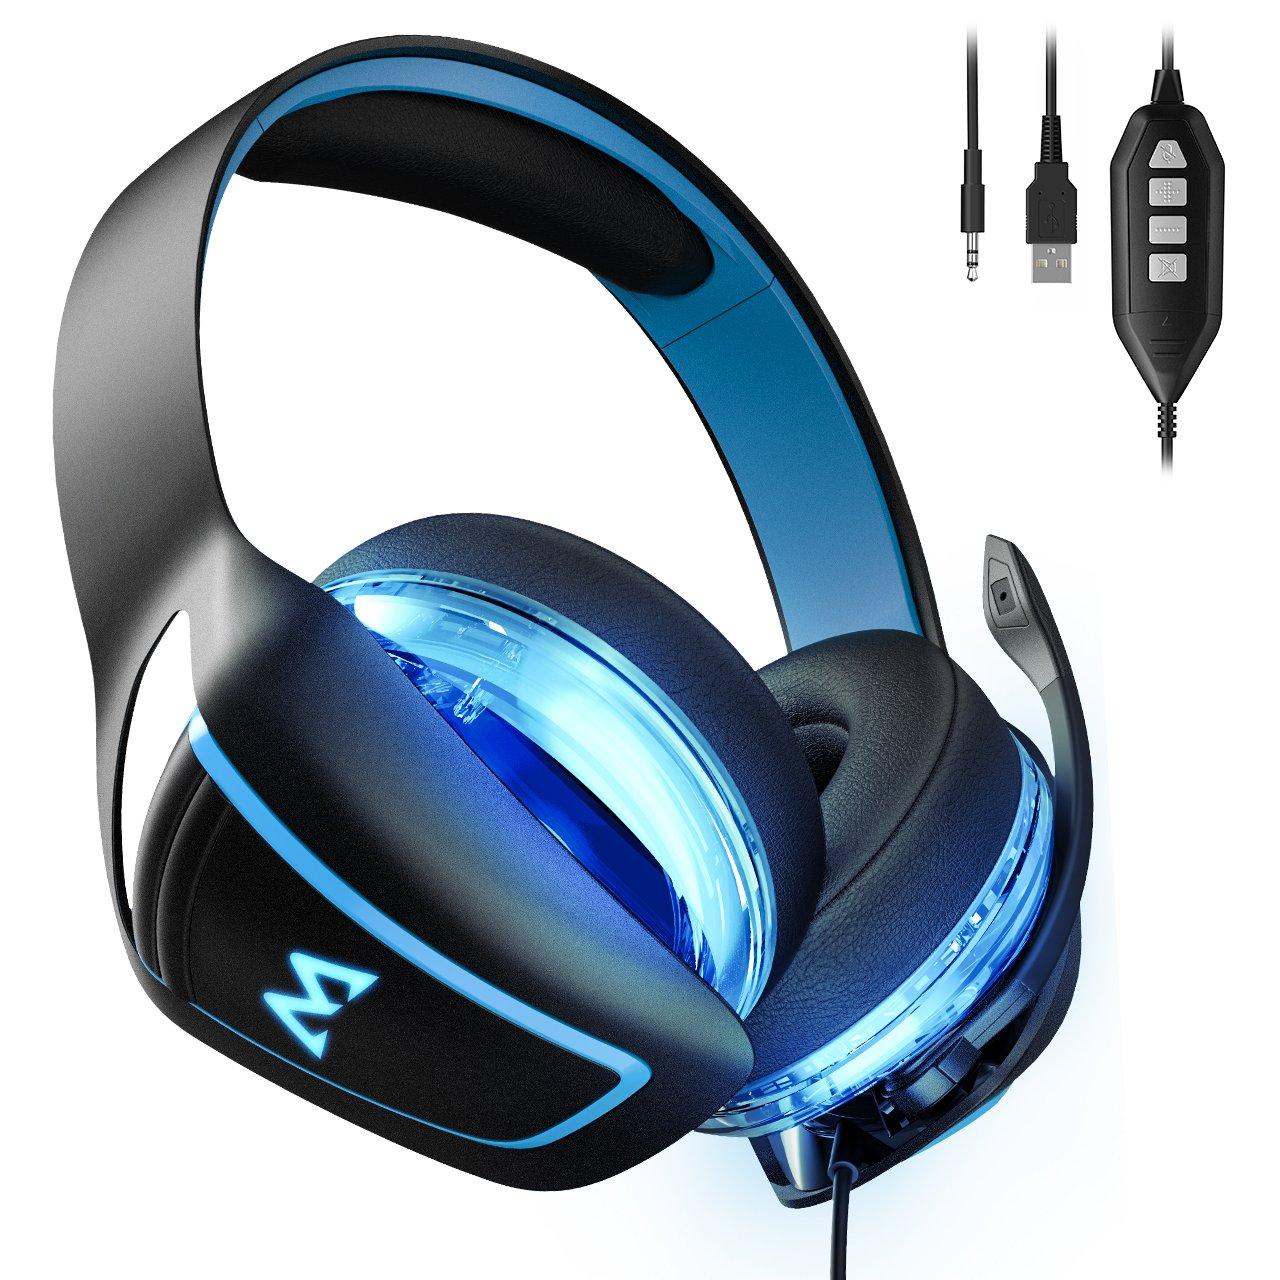 Mpow 7.1 Surround Sound Gaming Headset EG1 0ver Ear Headset Professionell Gaming Kopfhörer